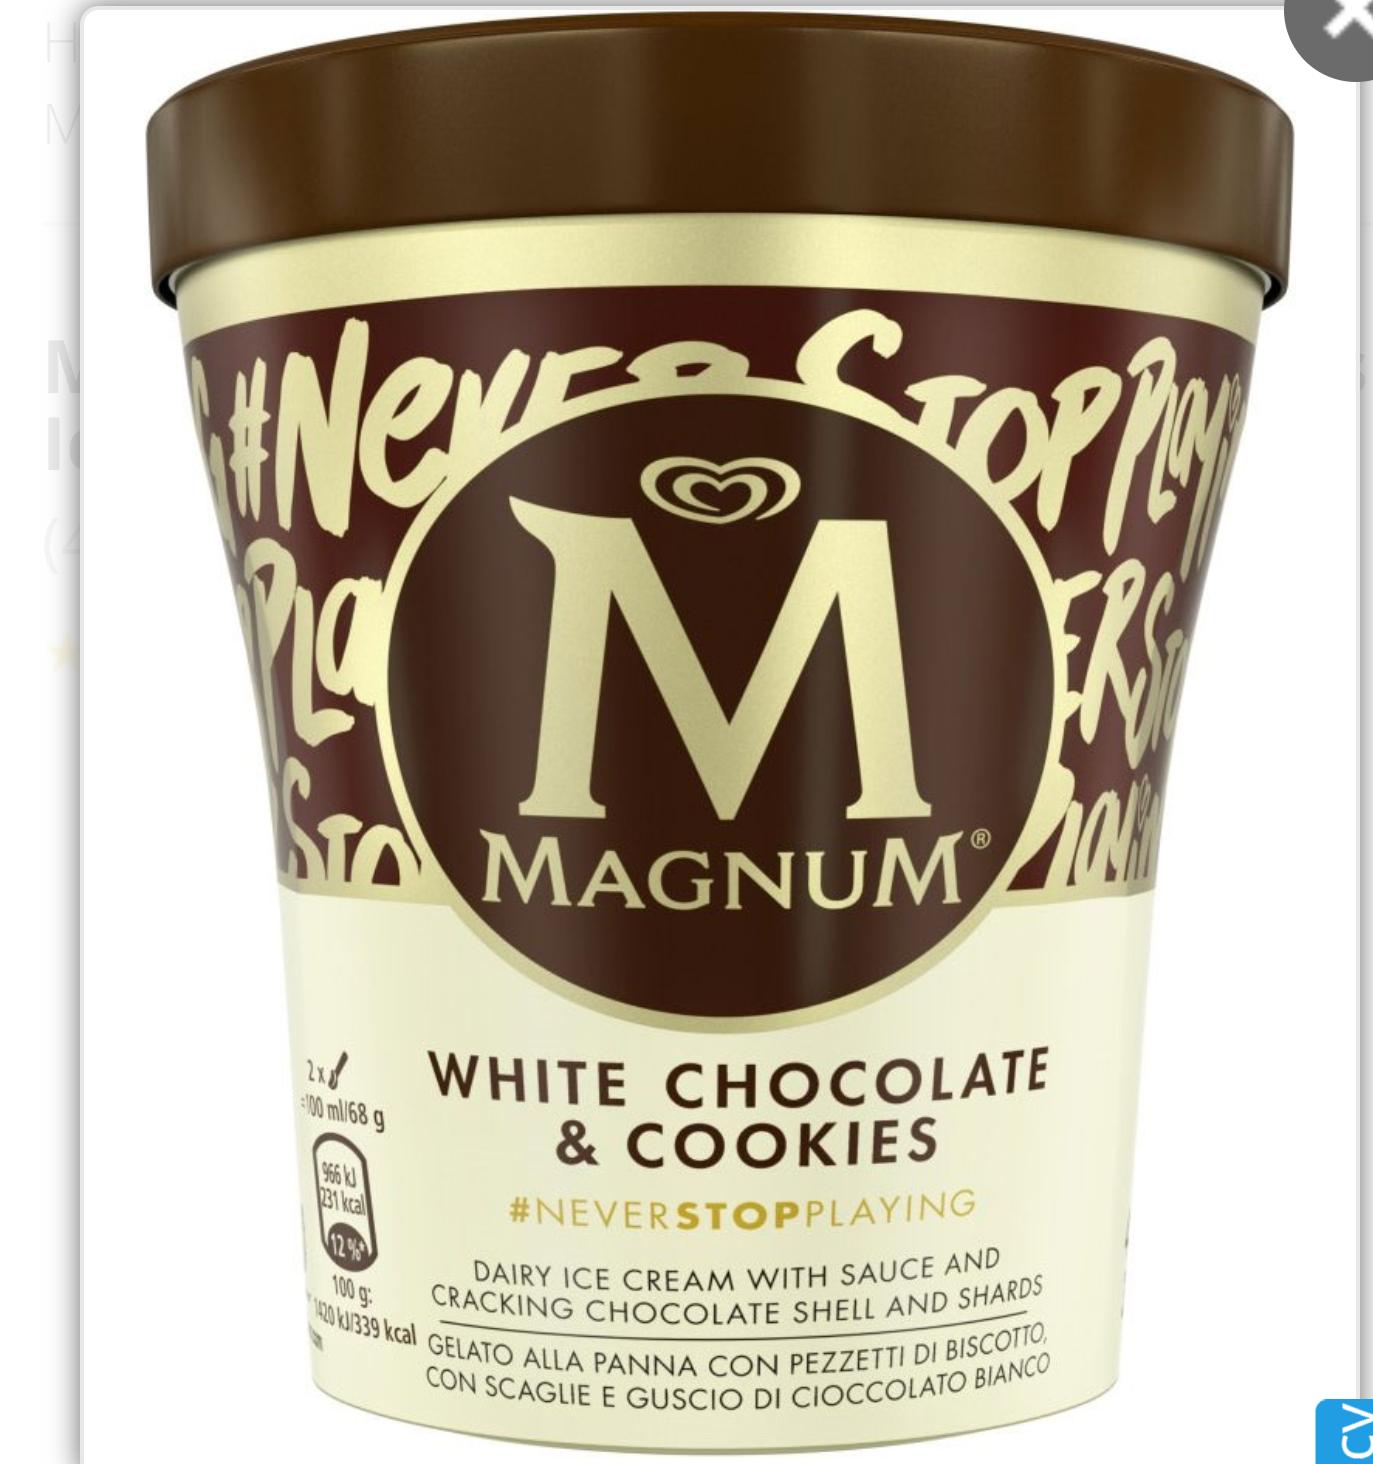 Magnum Tub White Chocolate & Cookies Ice Cream 440ml - £2 @ Sainsbury's